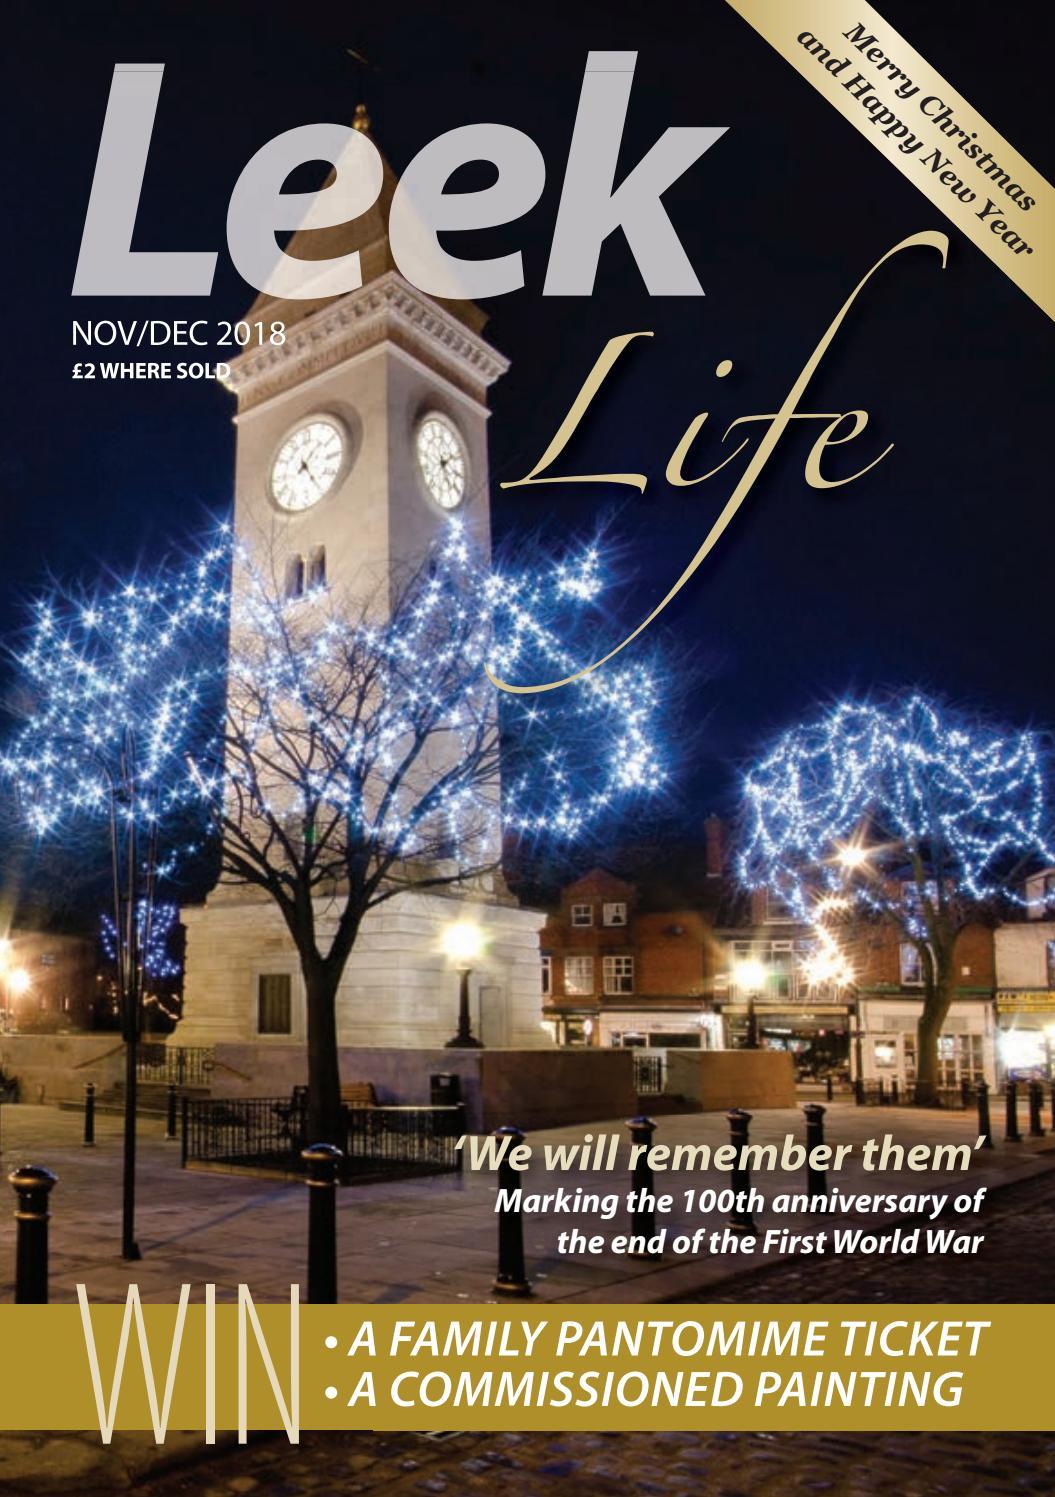 Leek Life Nov Dec 2018 By Times Echo And Life Issuu